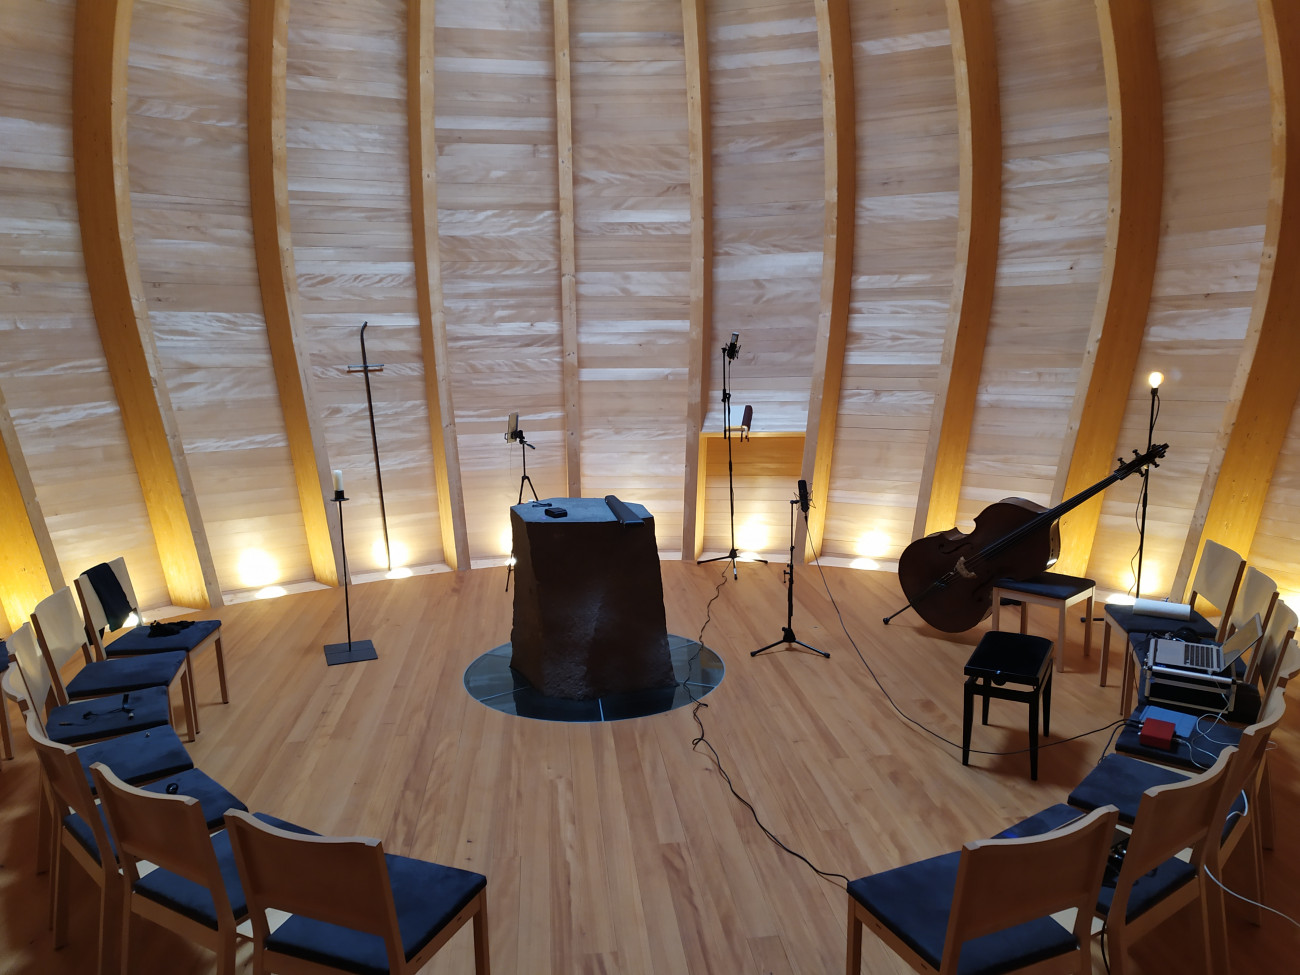 Kontrabass Hanns Höhn, Quartessenz- Kontrabass in der Holzkapelle Hanns Höhn